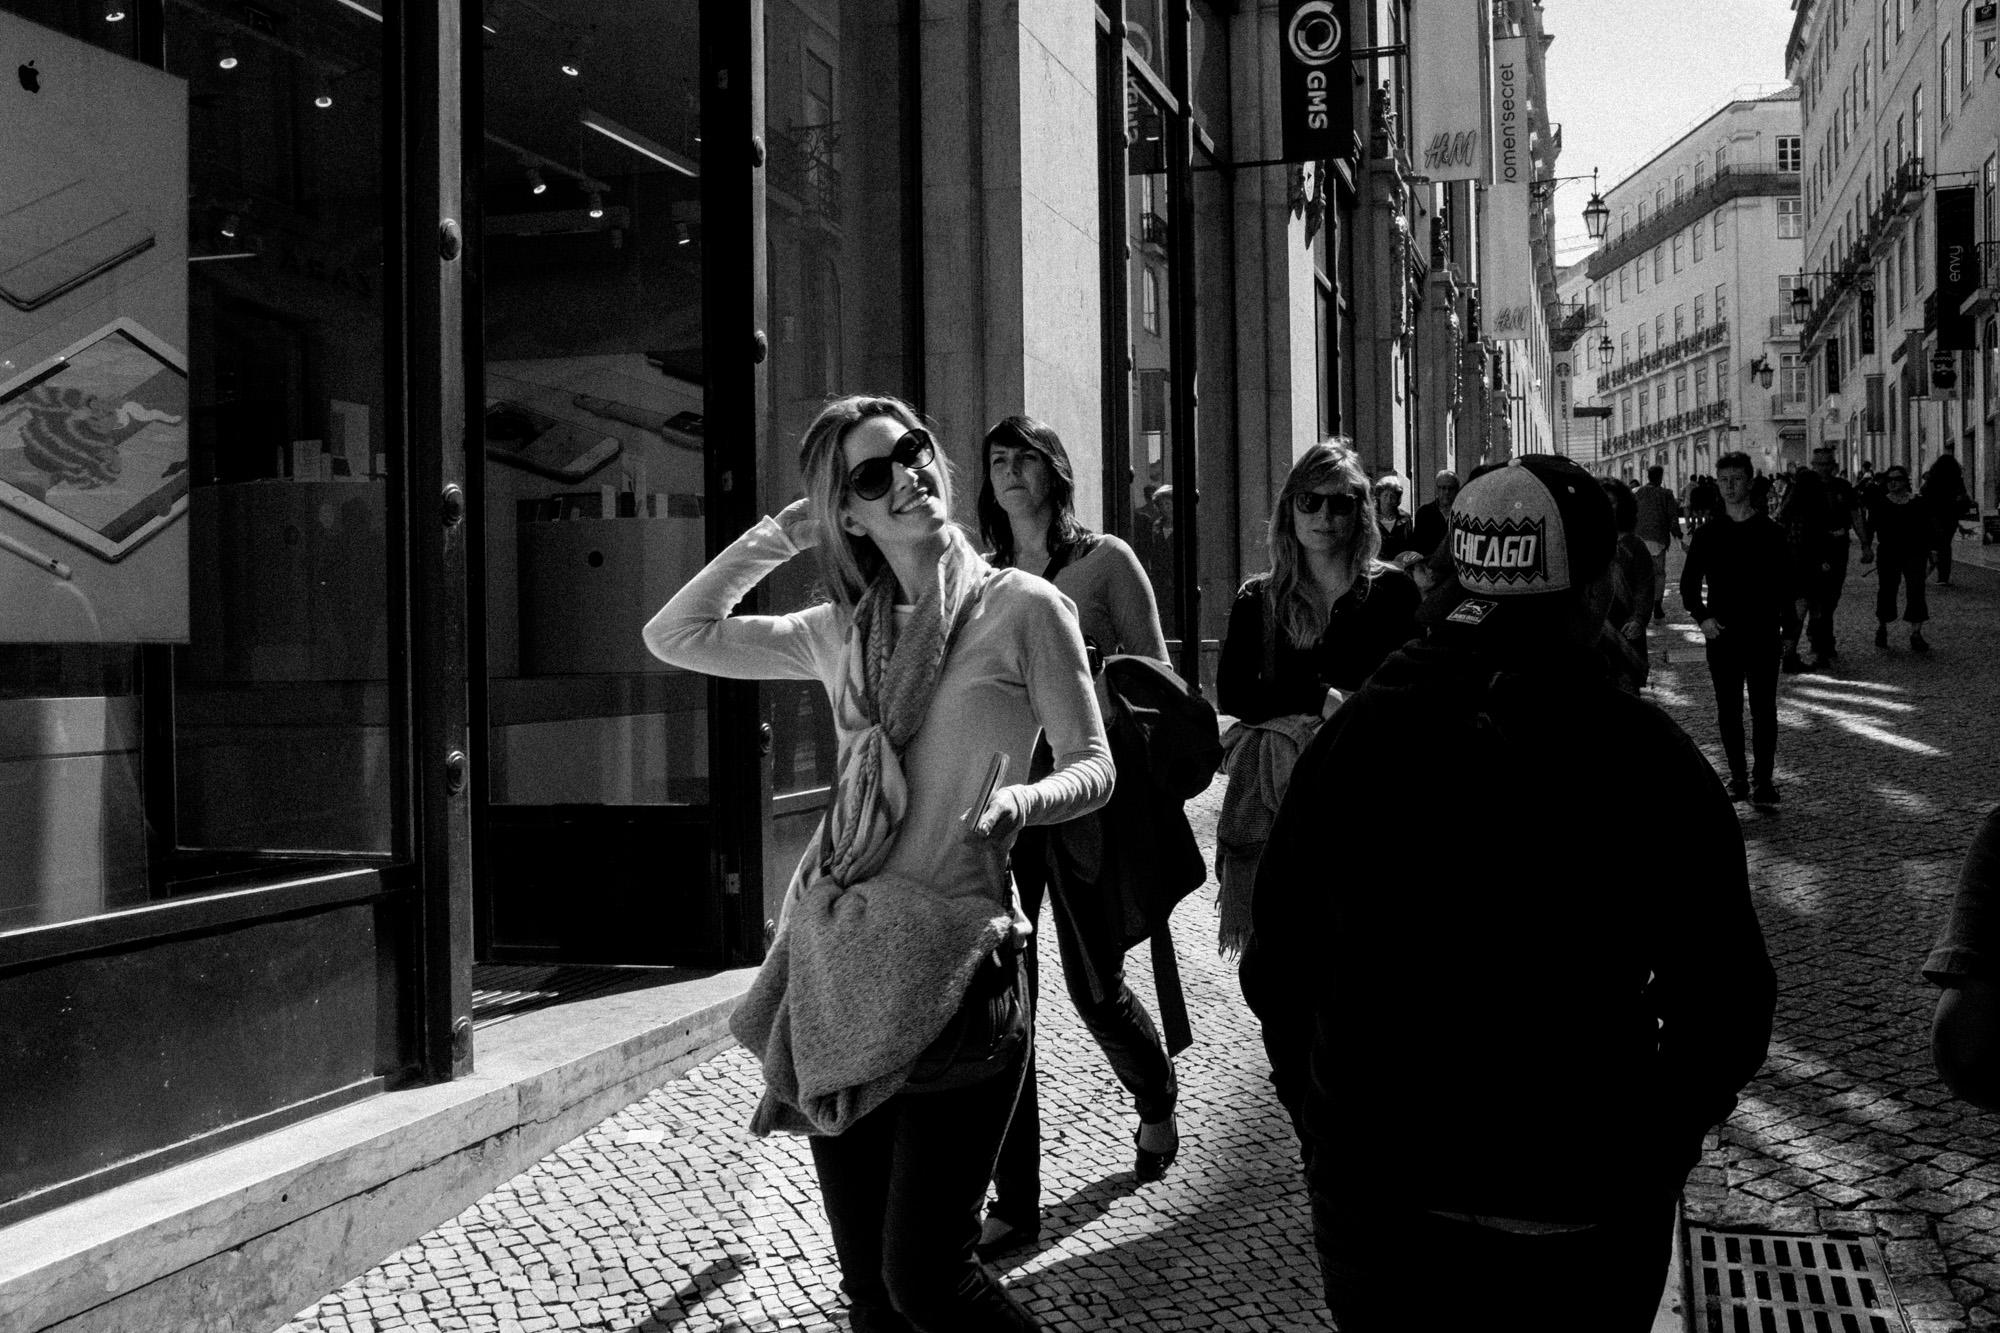 streets-of-lisbon-15.jpg